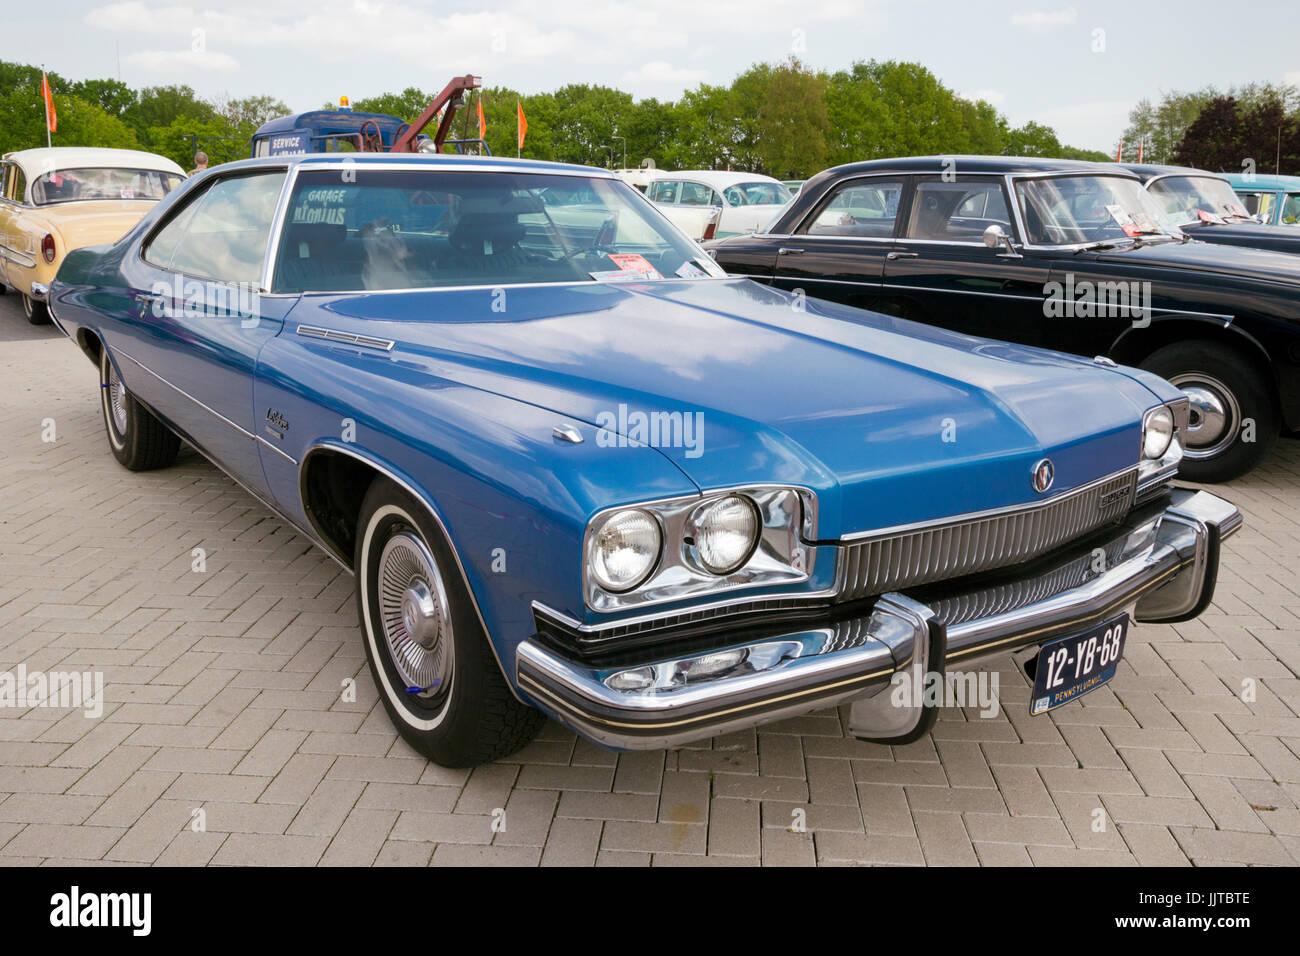 Den Bosch Niederlande 10 Mai 2015 Blau 1973 Buick Lesabre